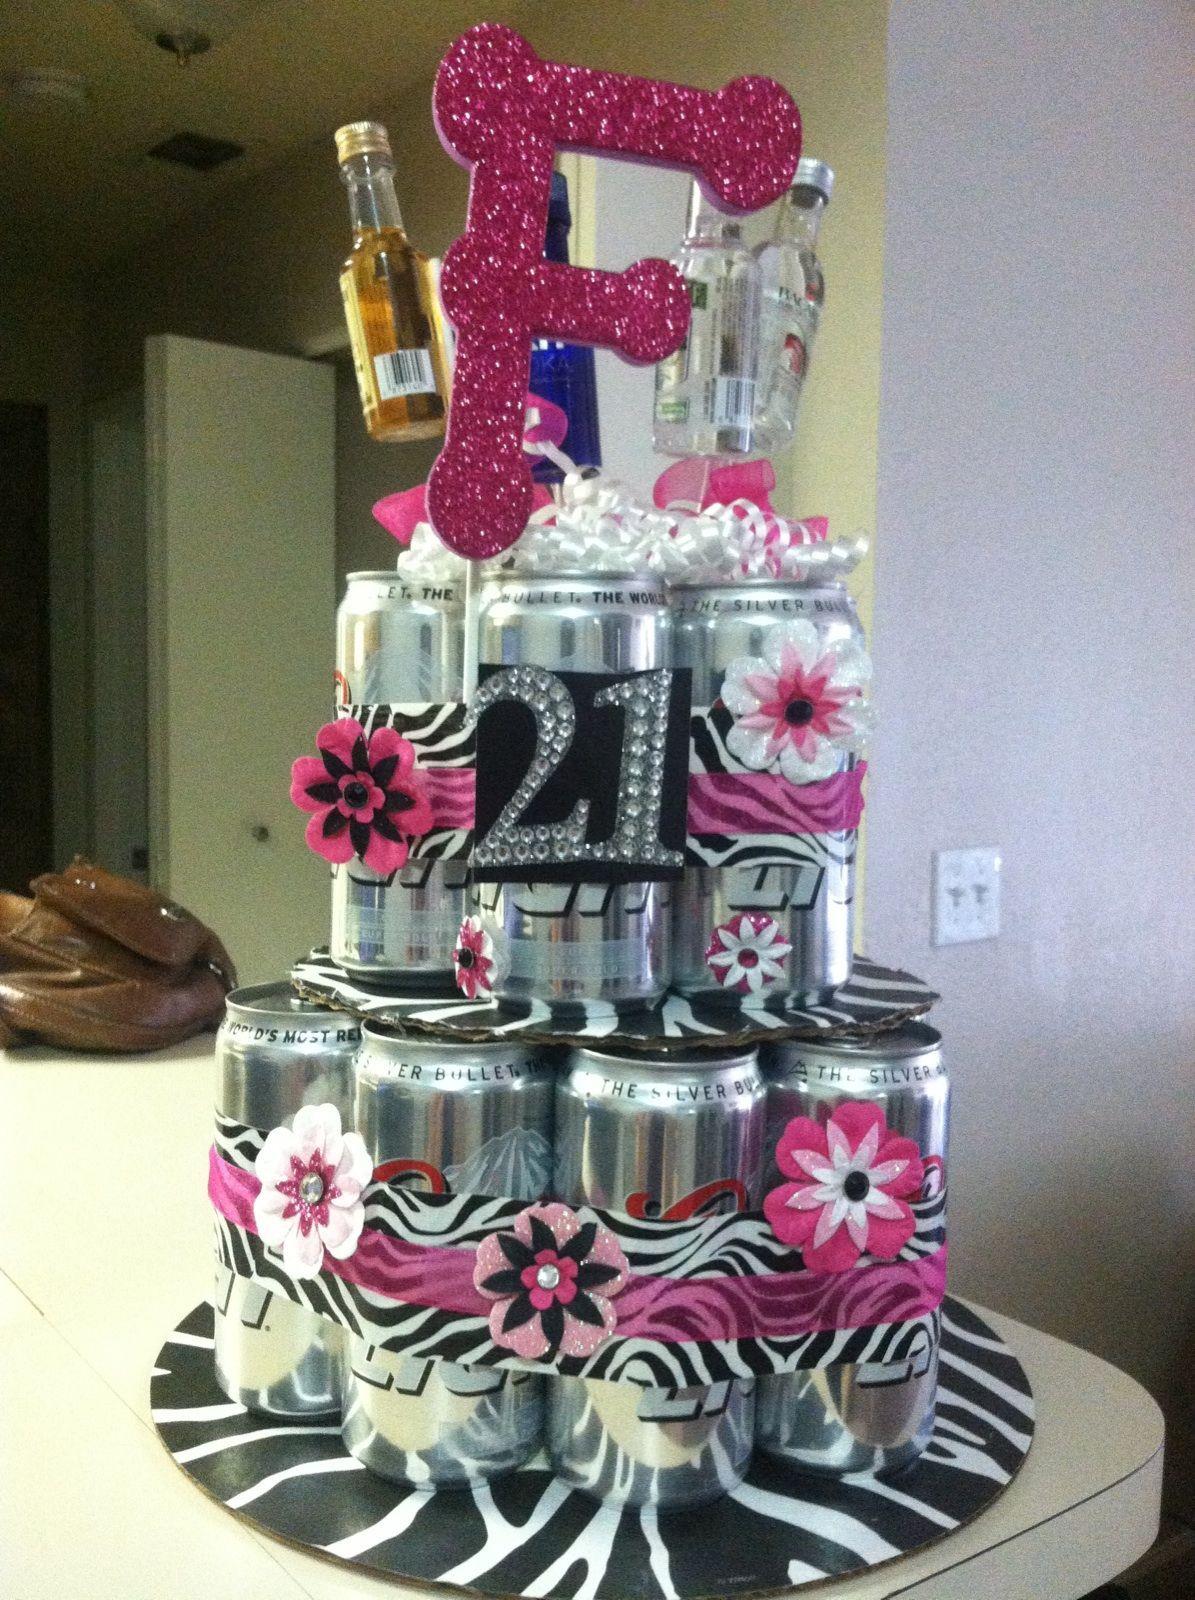 Pin by Brandi Blue on Drinks, all around! 21st birthday